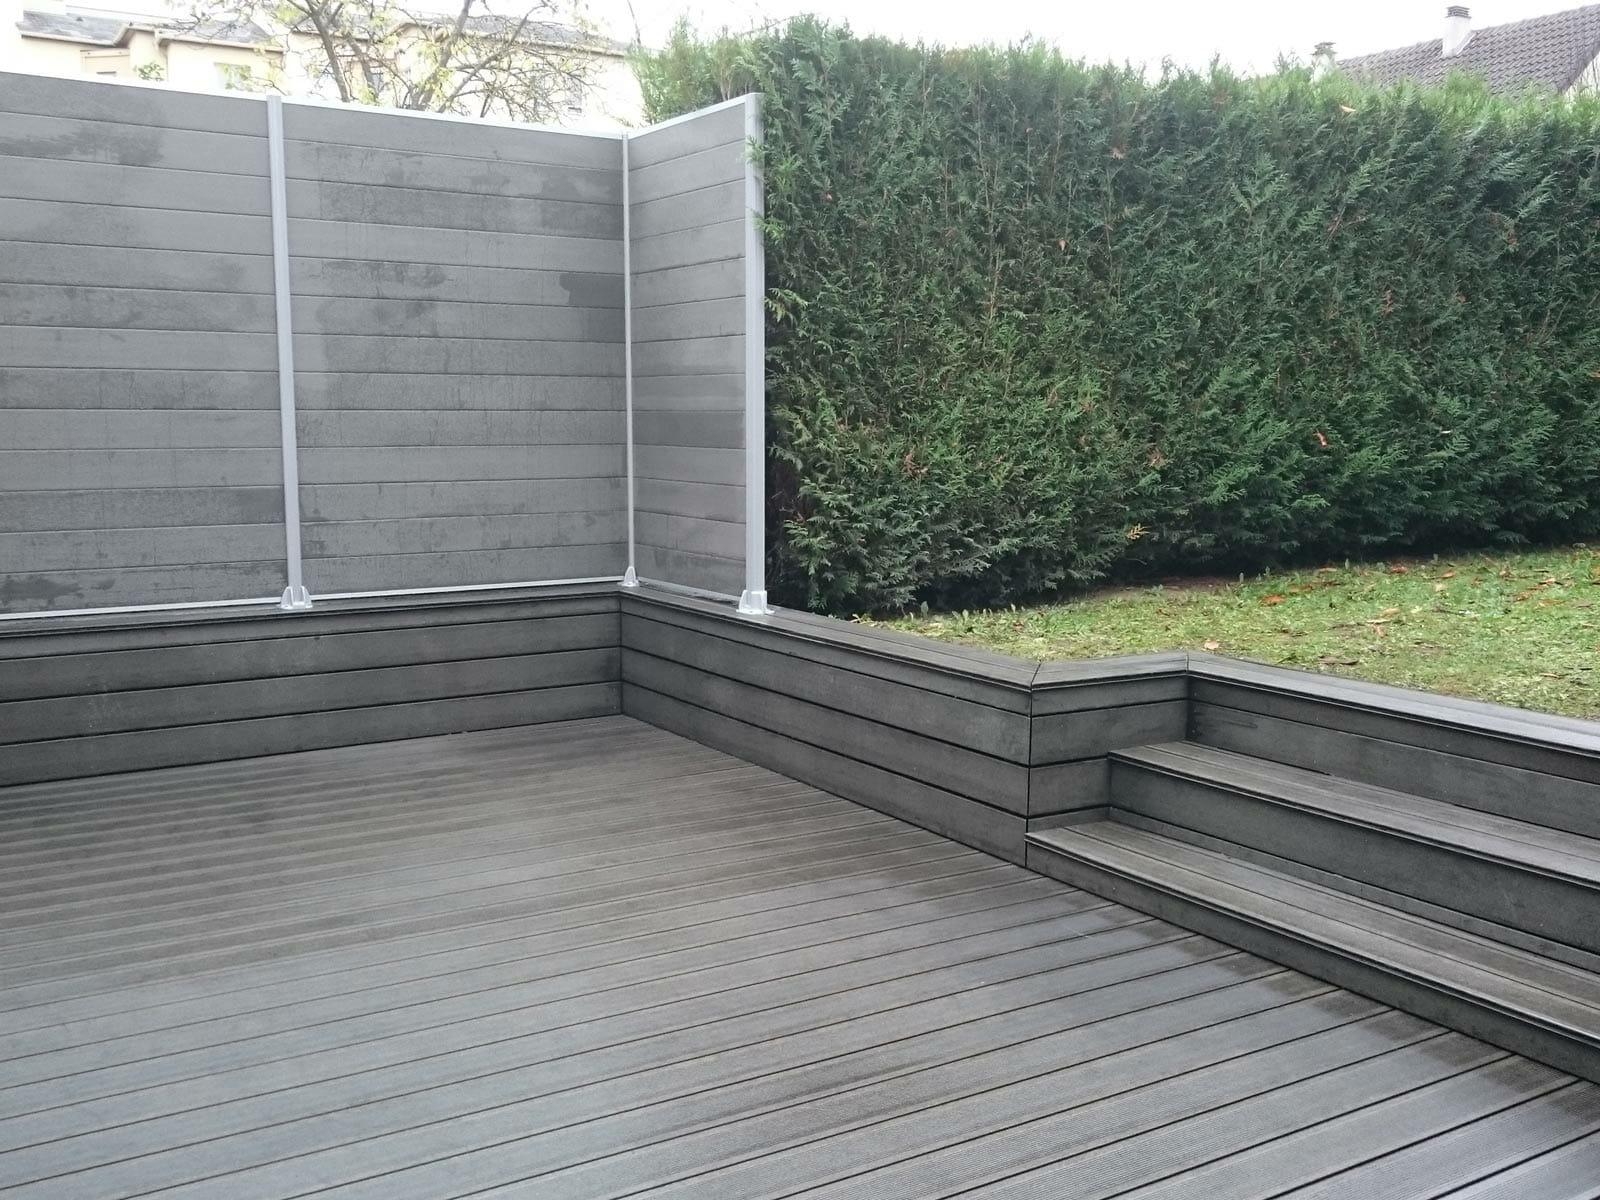 terrasse-composite-arpajon-detail-2